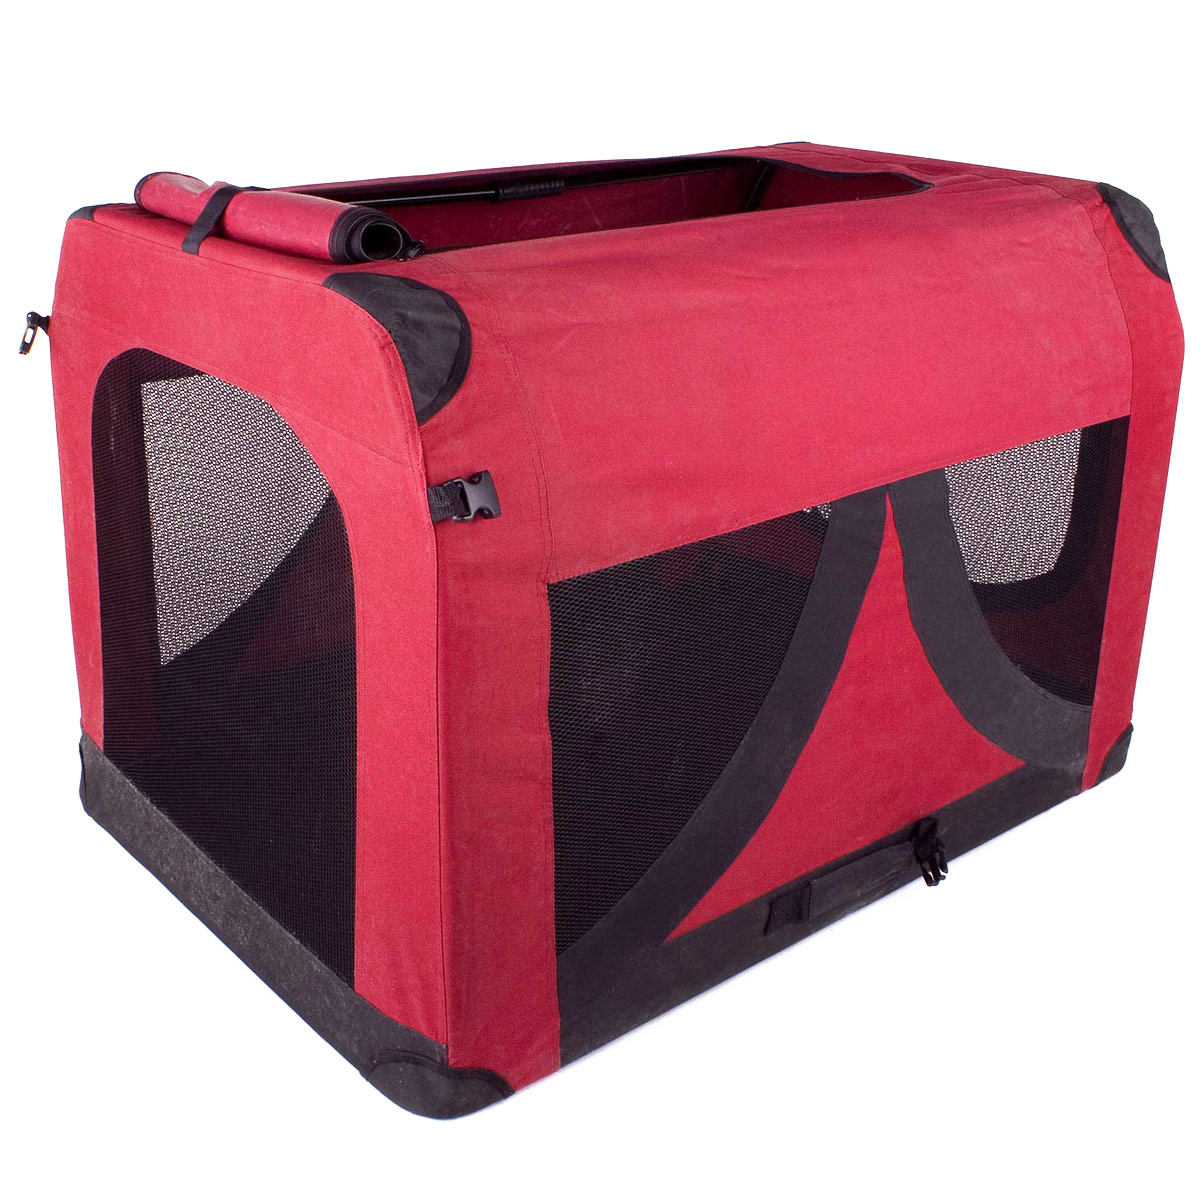 faltbare hundebox hunde transport box transportbox f r hund katzen s m l xl xxl ebay. Black Bedroom Furniture Sets. Home Design Ideas